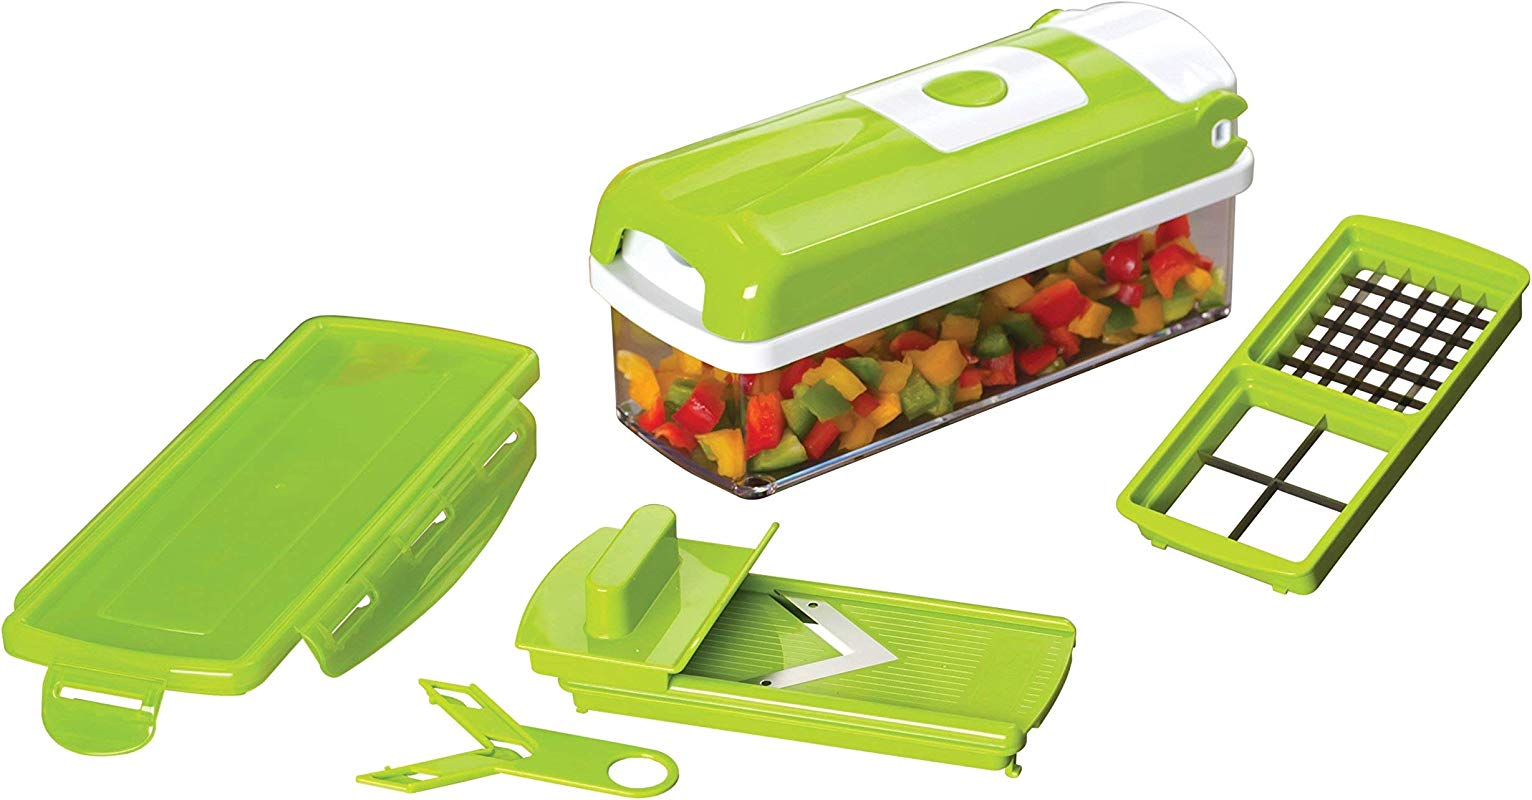 One Second Slicer All In One Vegetable Slicer And Food Preparation Station